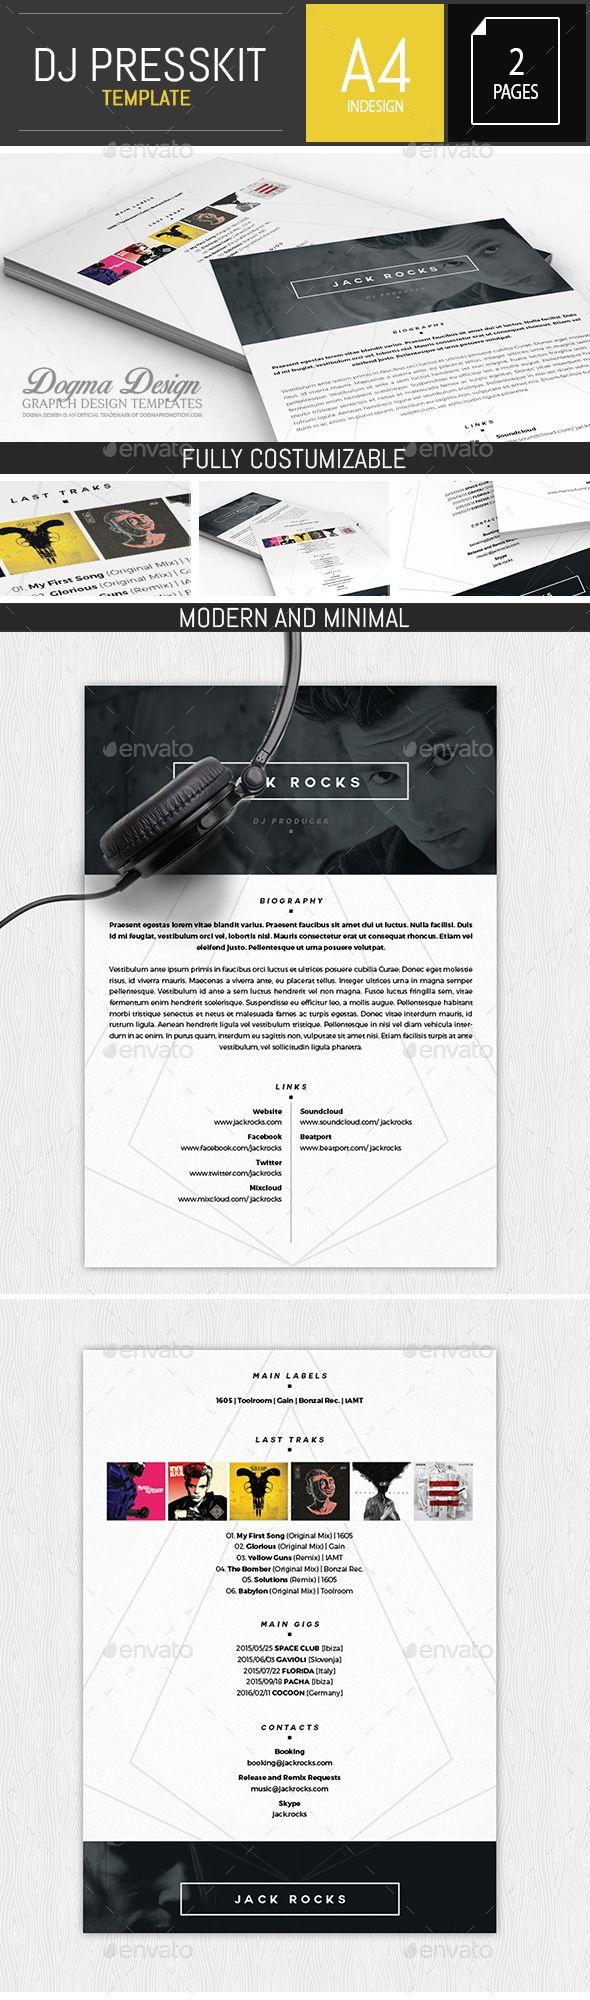 Musician / Dj Press Kit / Resume InDesign Template